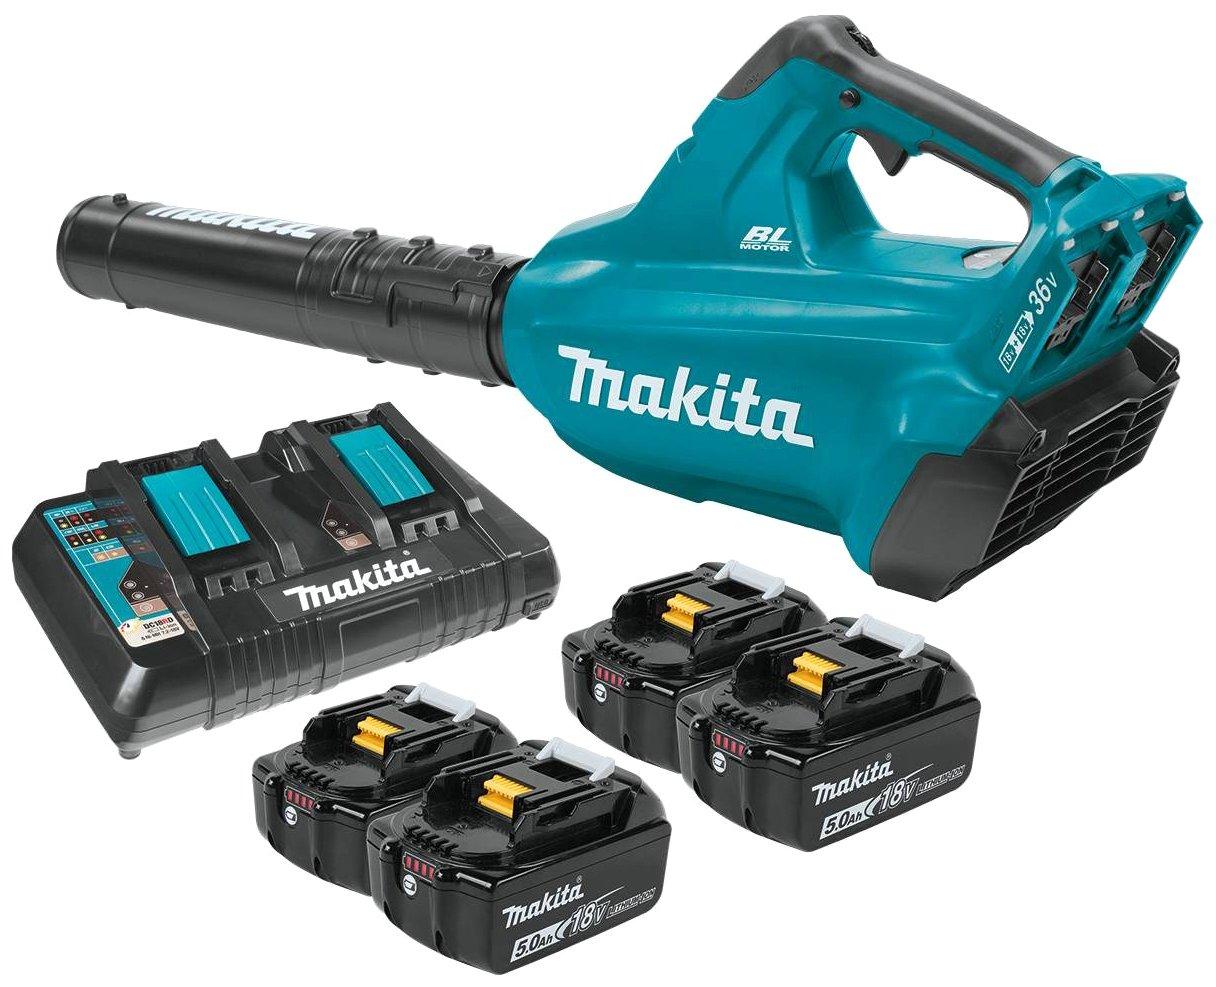 Makita XBU02PT1 Cordless Blower Kit with 4 Batteries